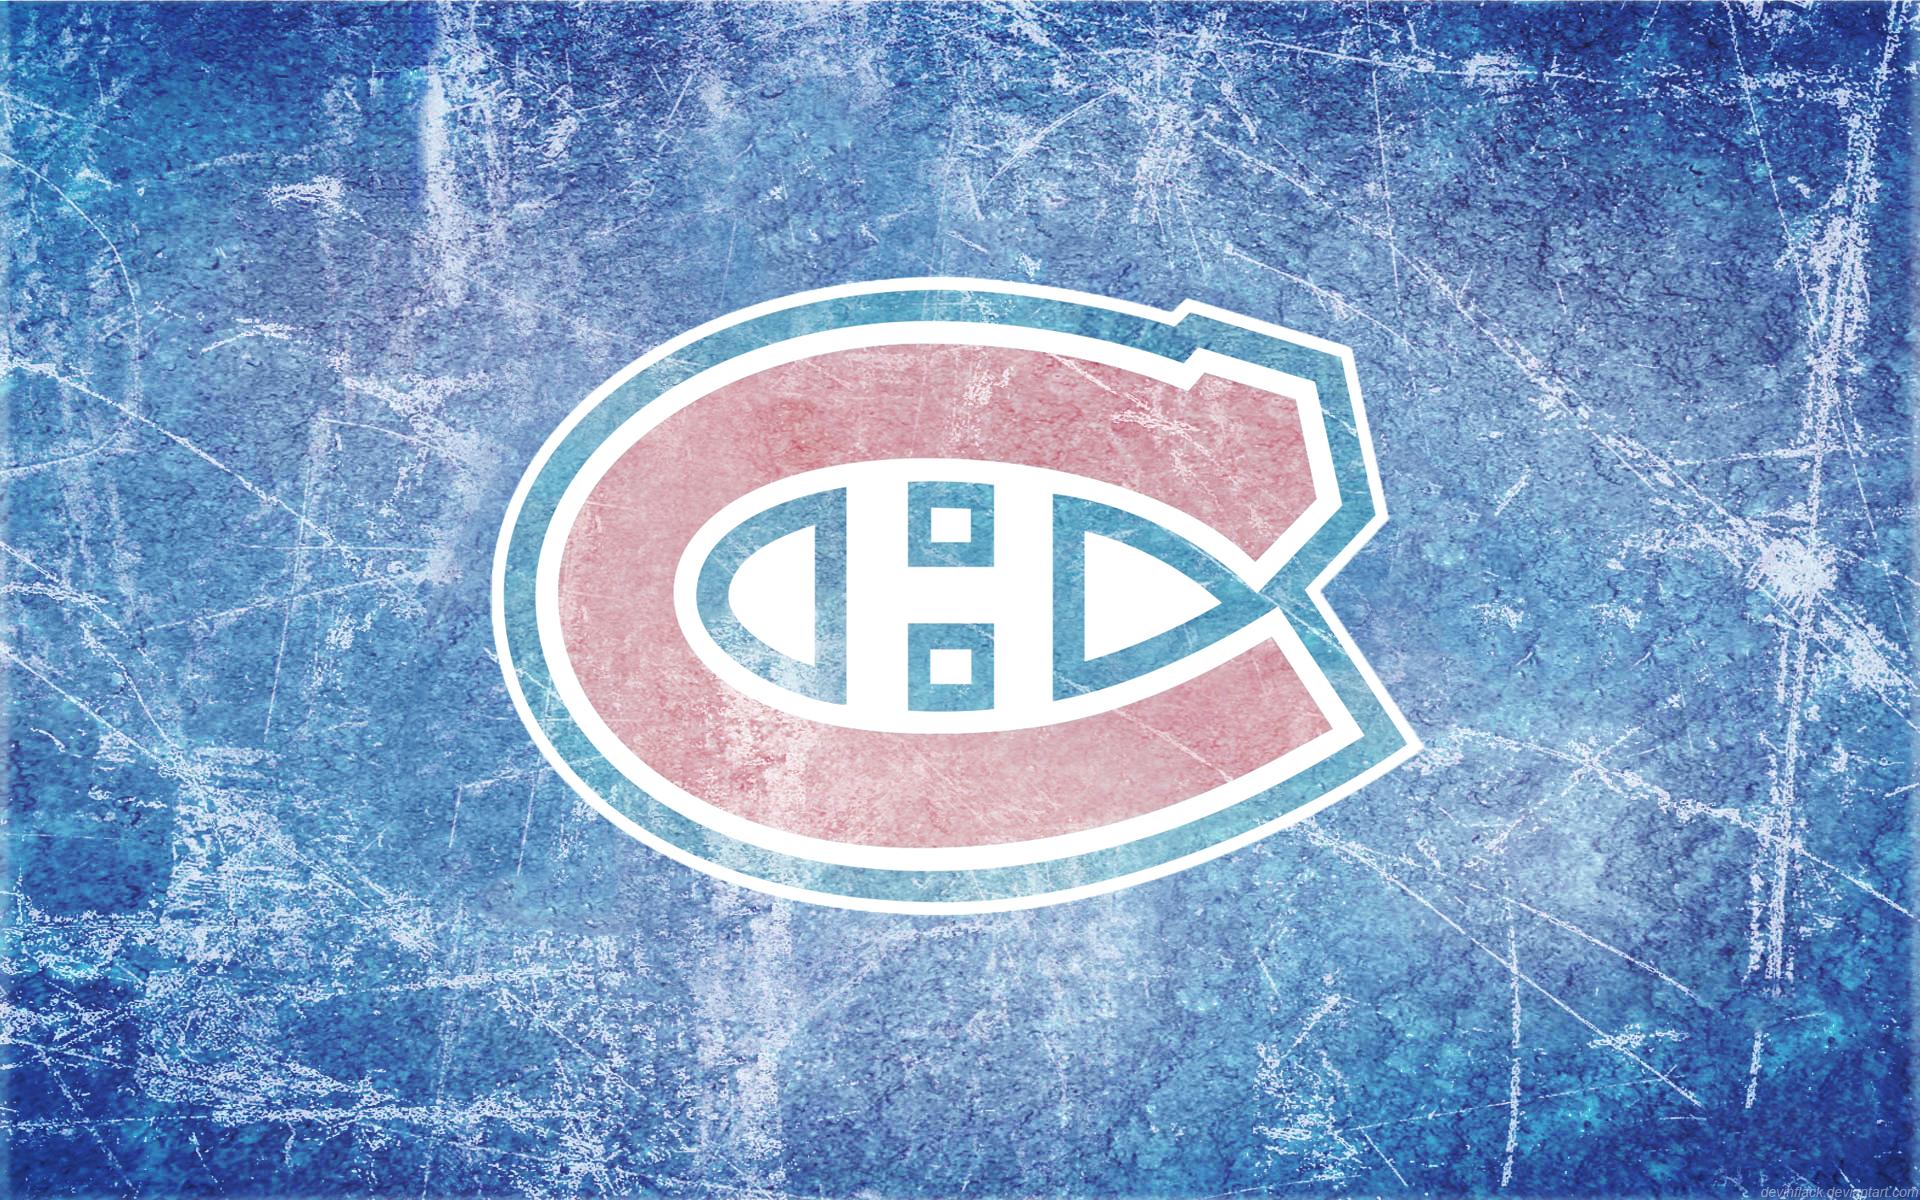 Montreal Canadiens Logo wallpaper 123213 1920x1200